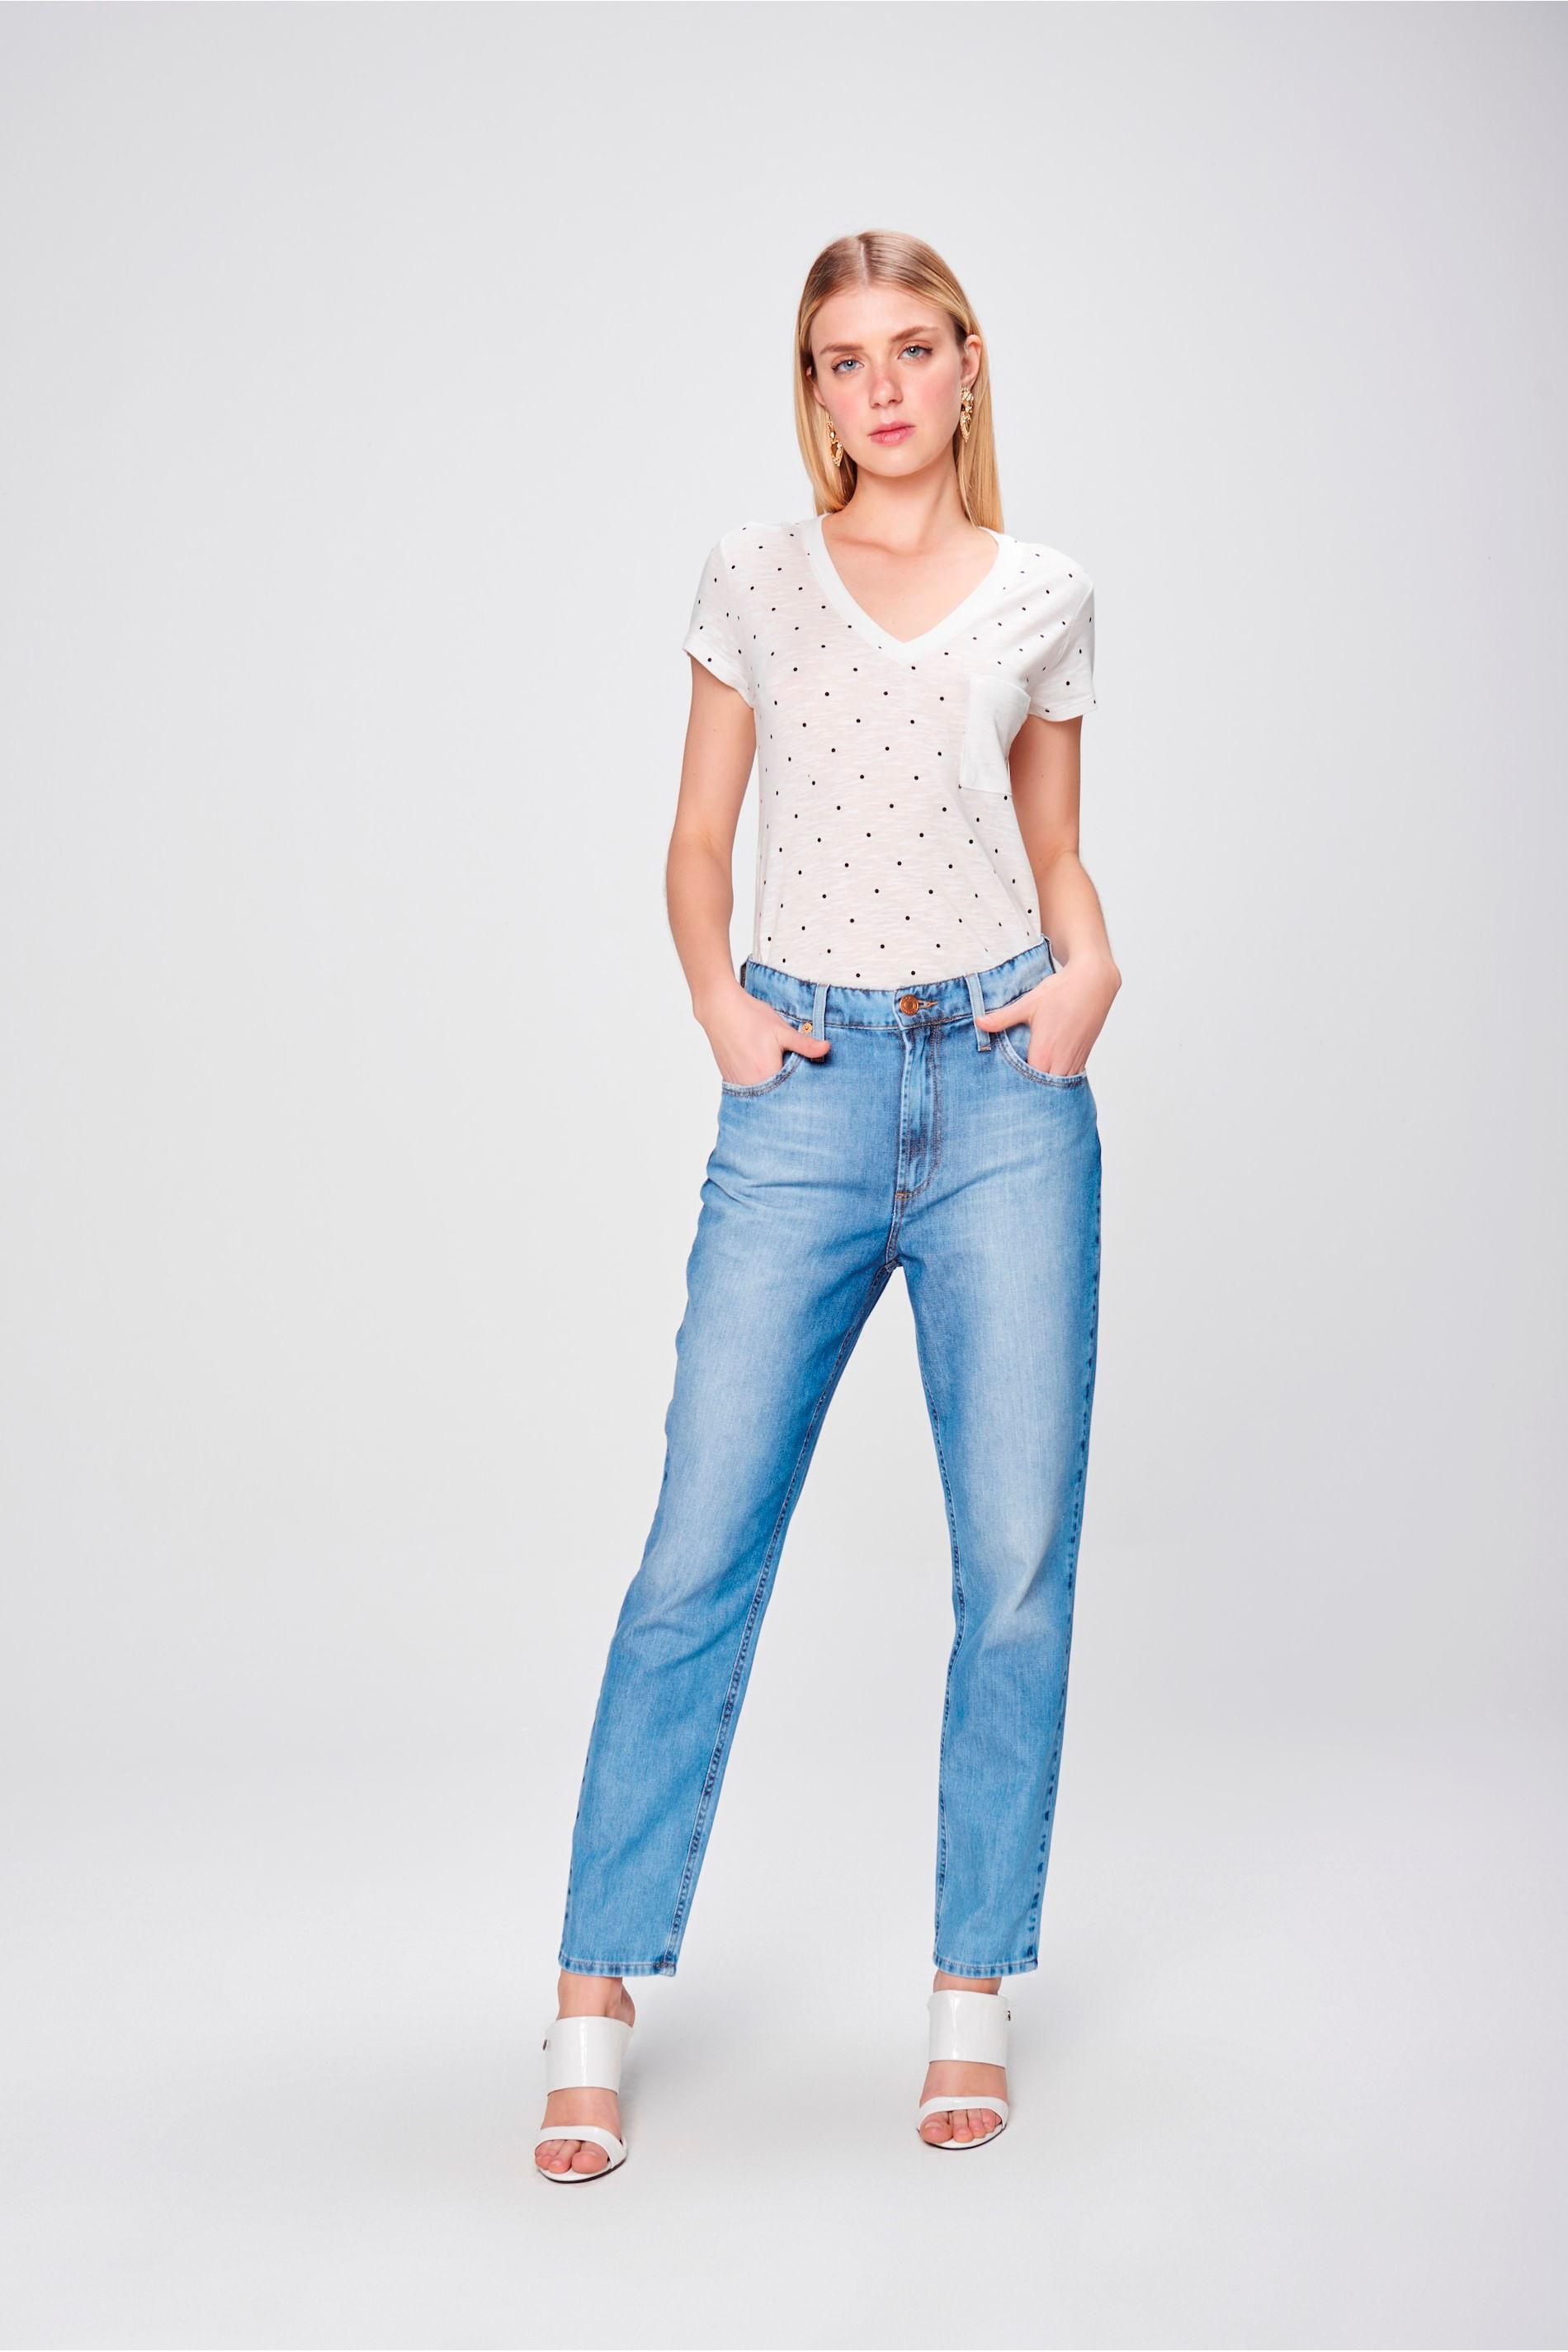 1b6119741 Calça mom jeans feminina damyller jpg 1900x2850 Calca mom jeans